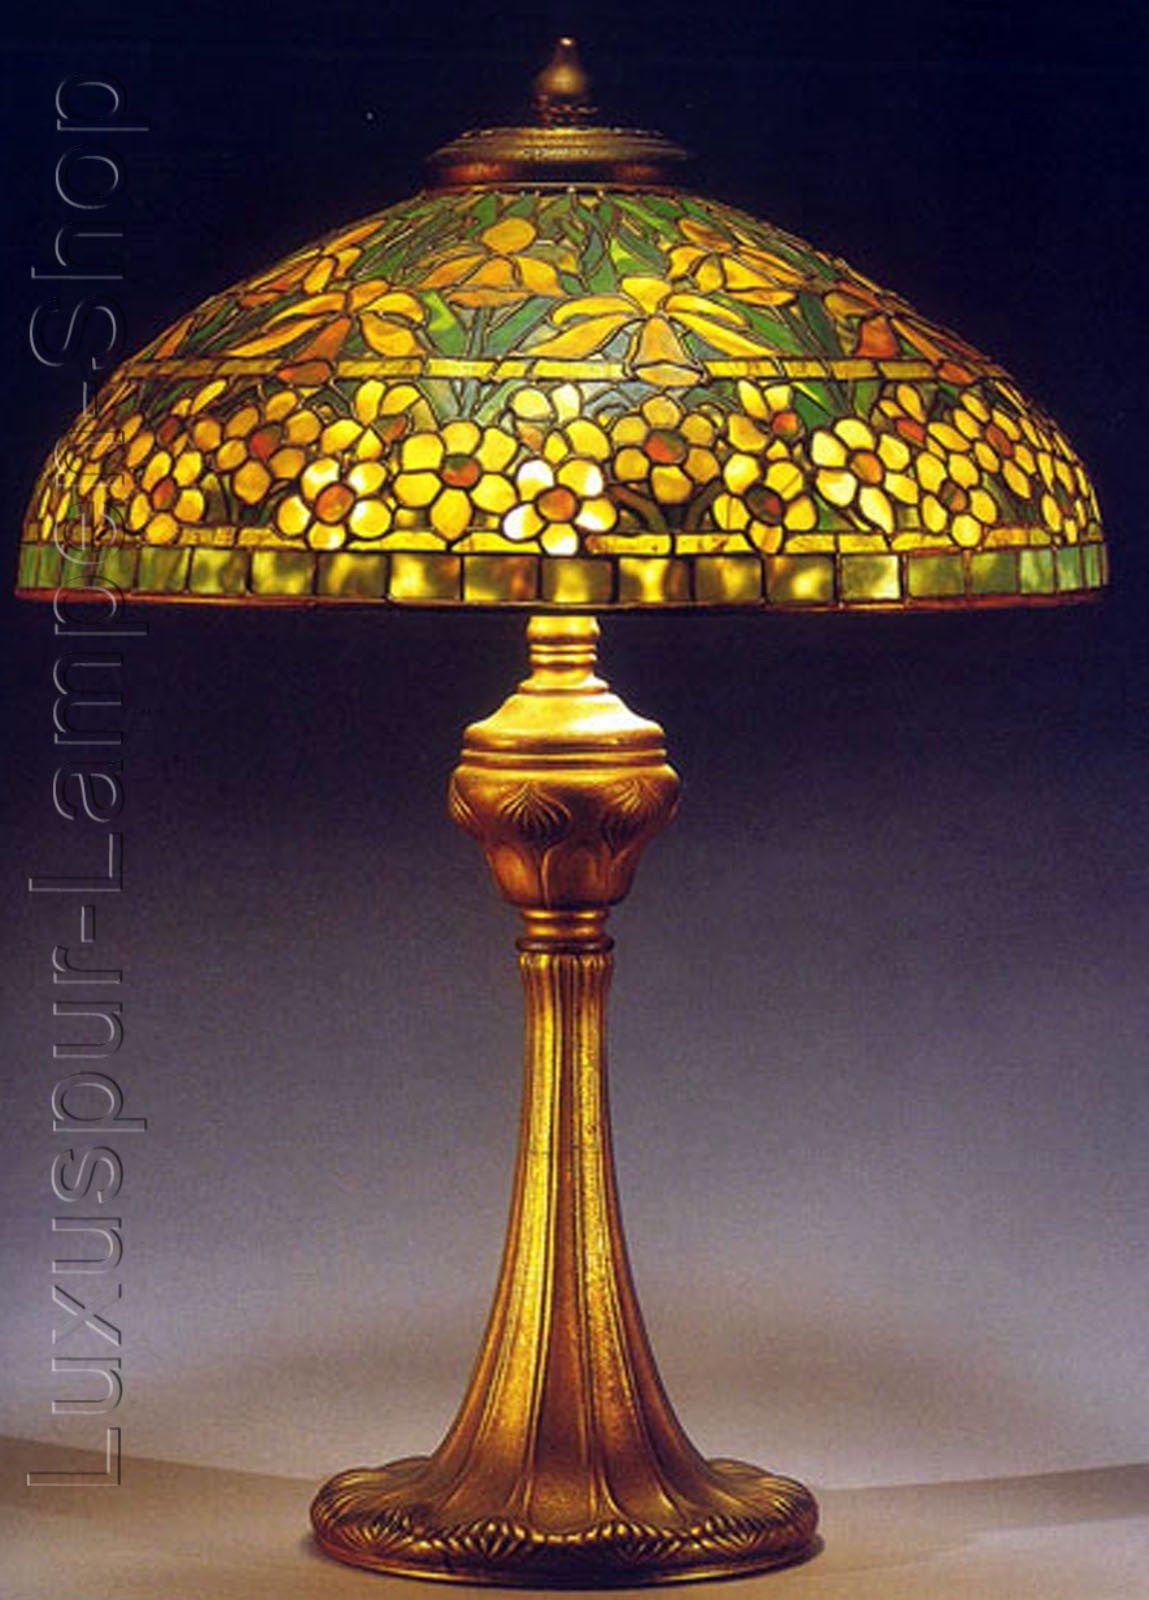 tischlampe replikat einer tiffany lampe im design goldrose mit rundem lampenfu aus bronze. Black Bedroom Furniture Sets. Home Design Ideas